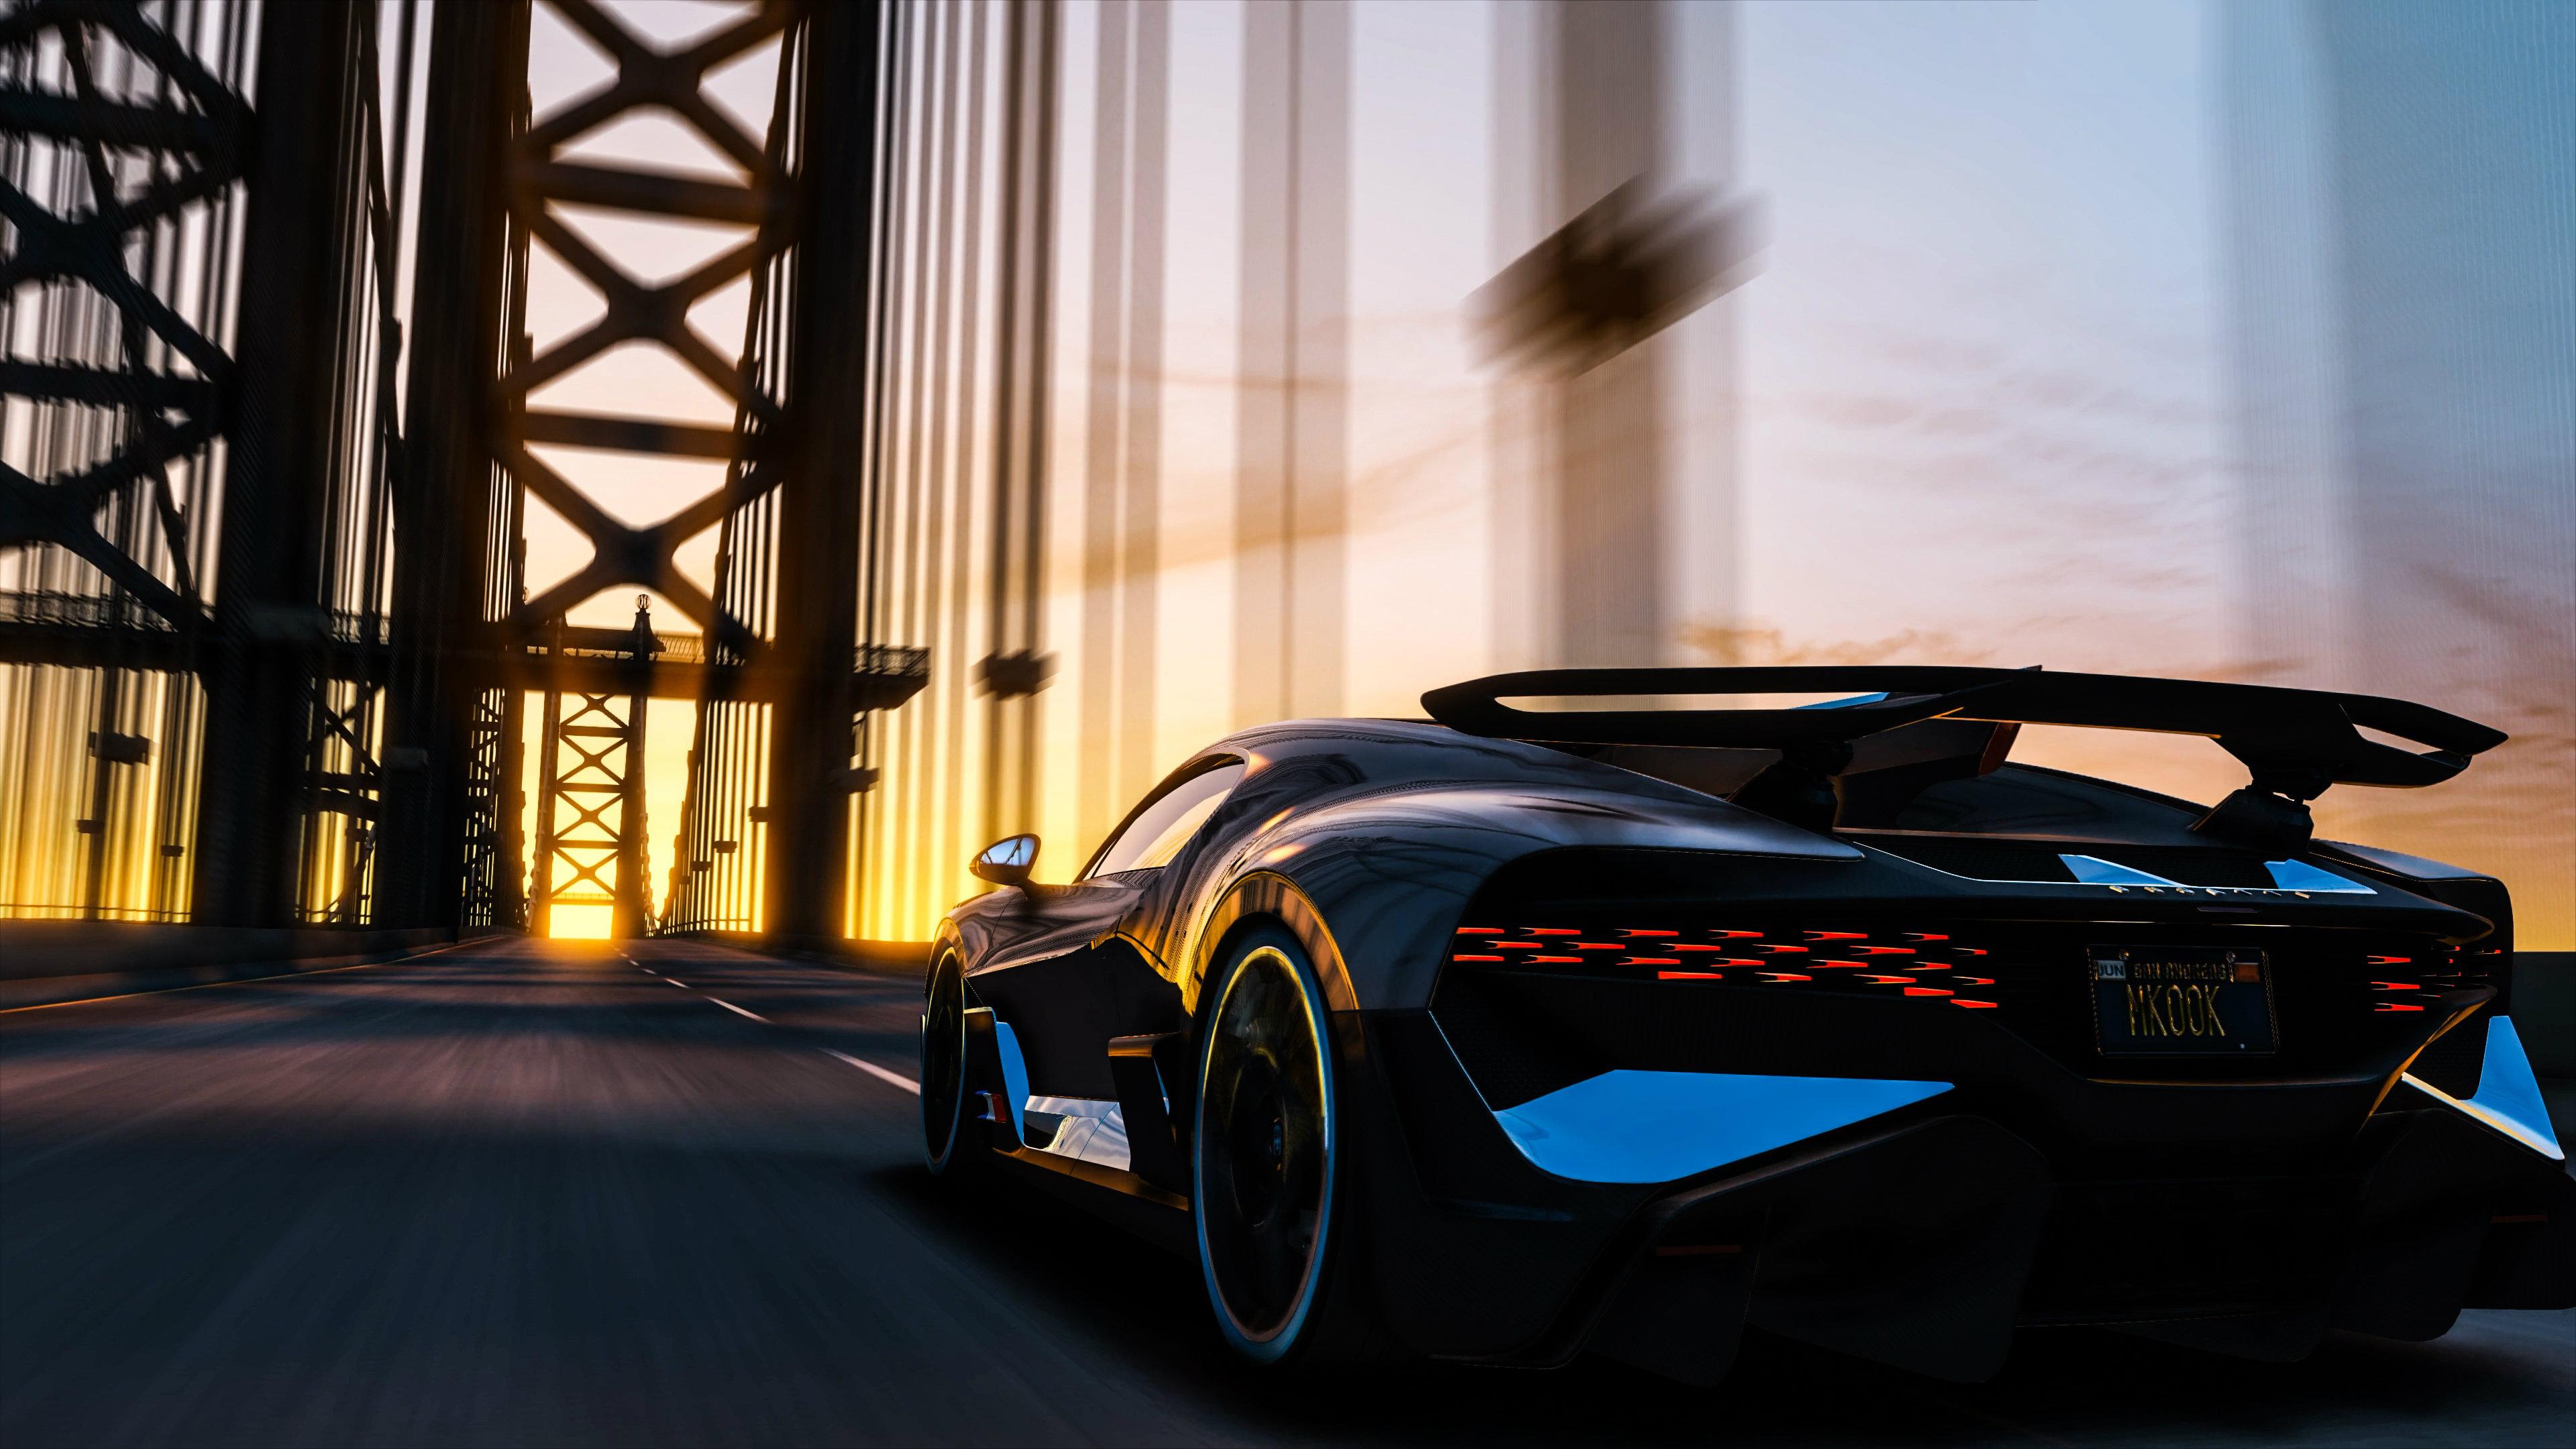 Bugatti Divo Bridge 4k Hd Cars 4k Wallpapers Images Backgrounds